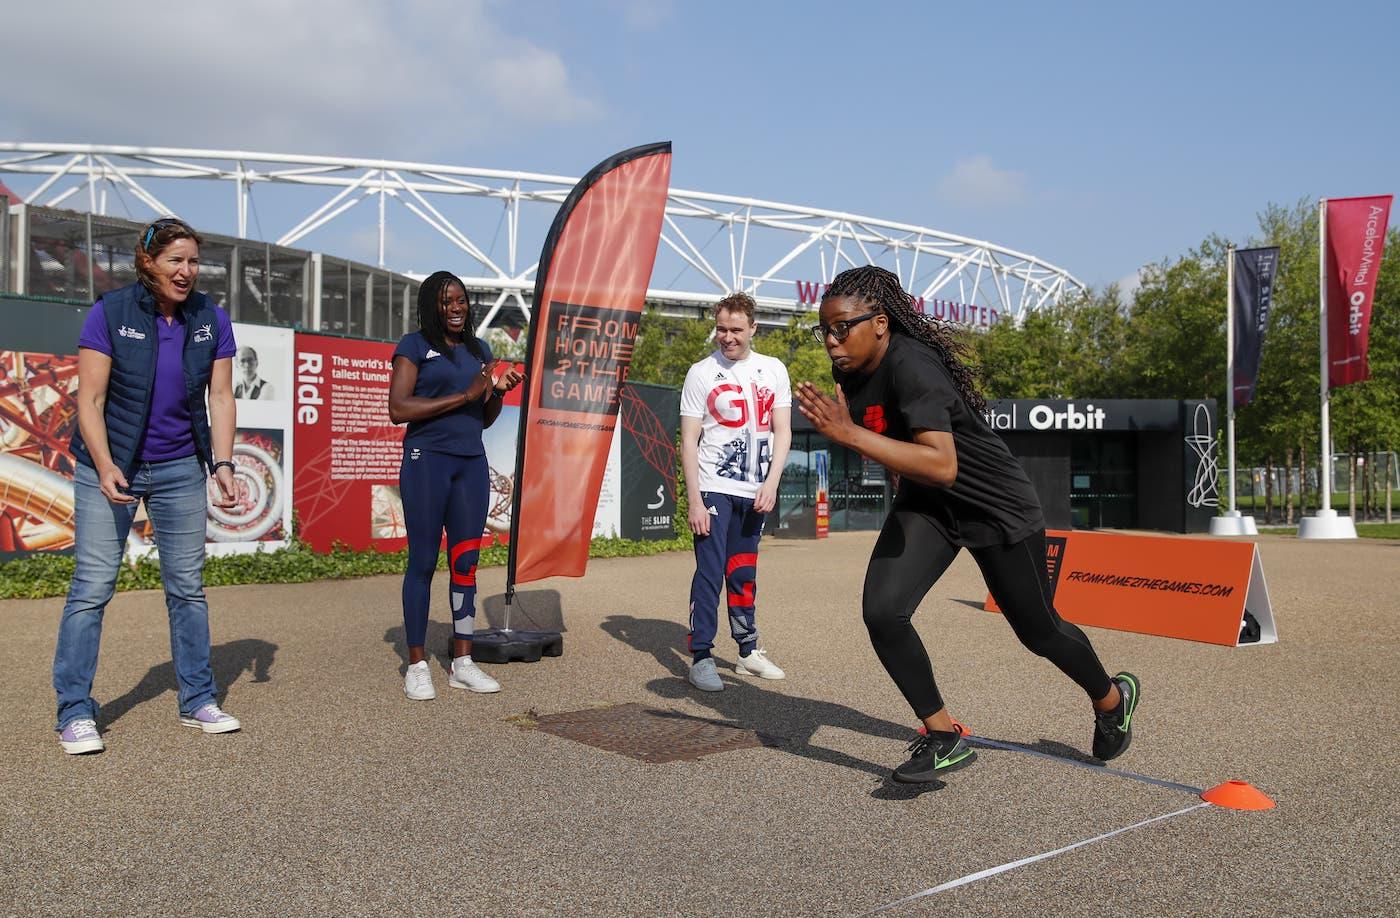 UK Sport EIS Team GB ParalympicsGB 19 Sports Unique Collaboration